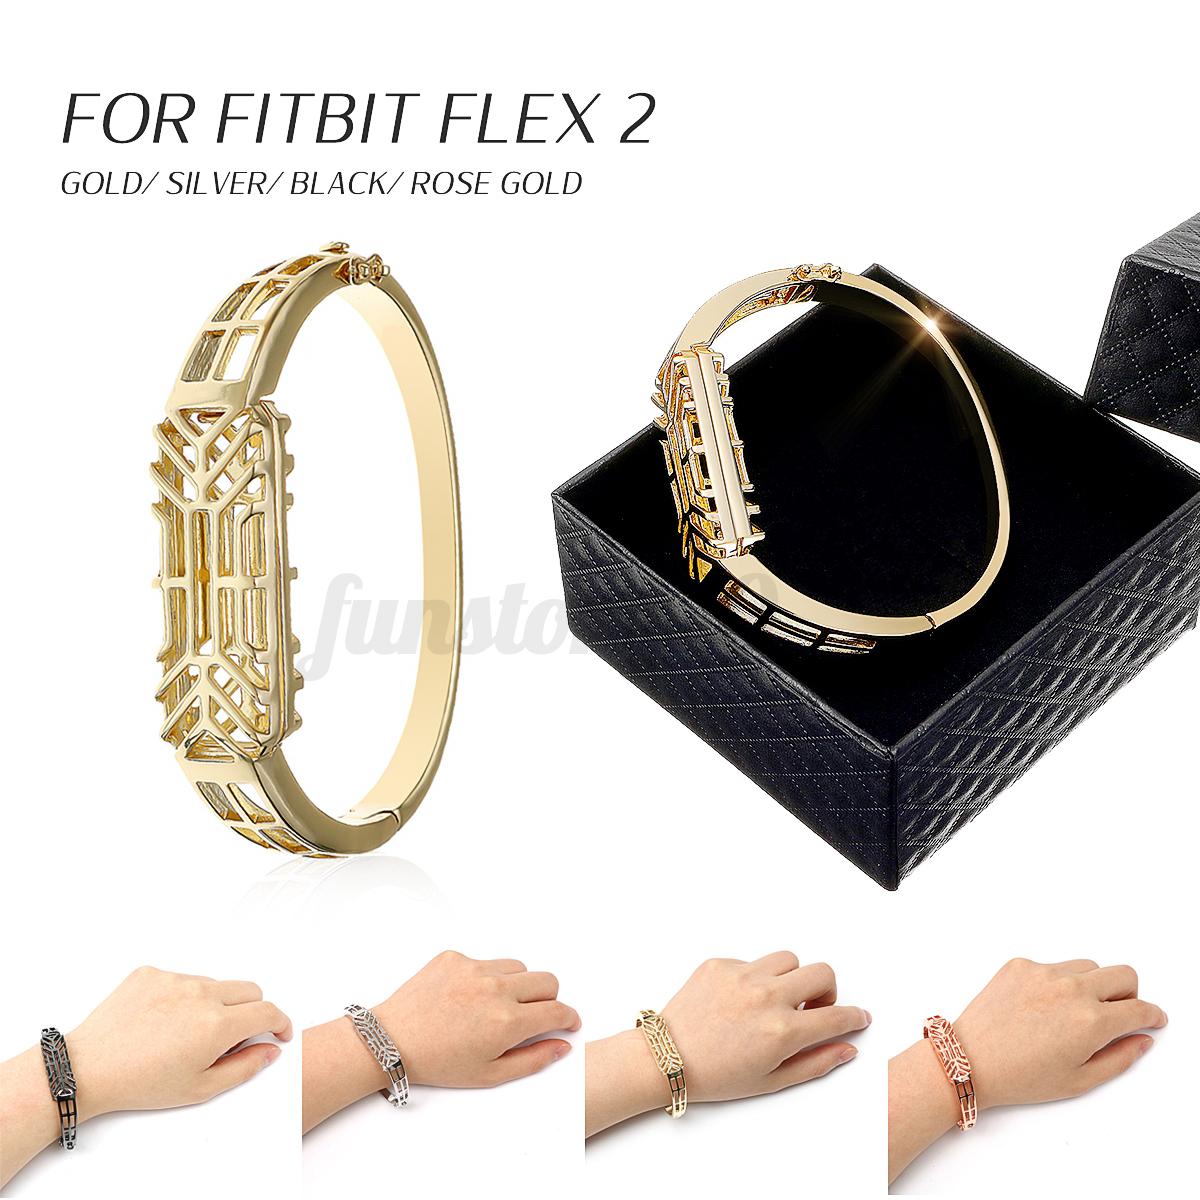 Edelstahl Armband Armreif Band Handschlaufe für Fitbit Flex 2 Tracker Geschenk